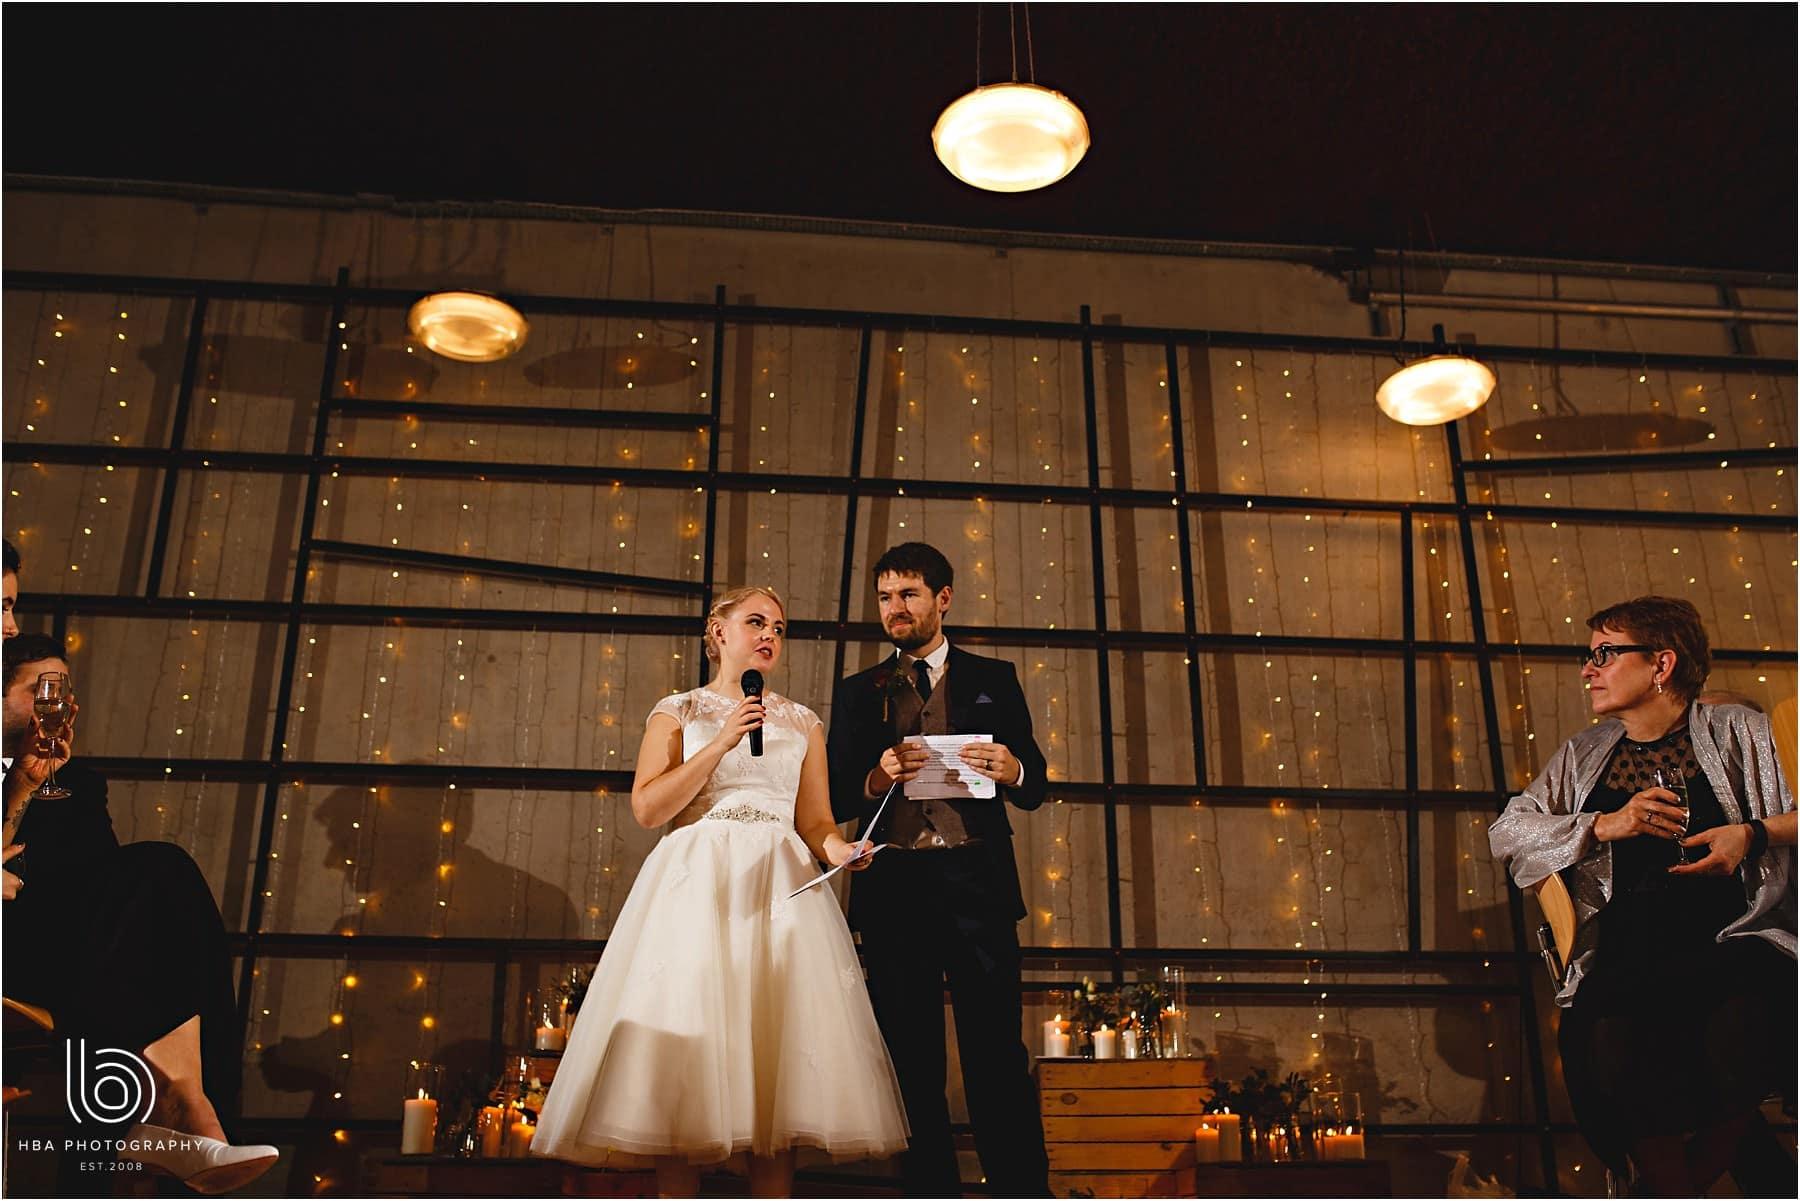 The bride speech